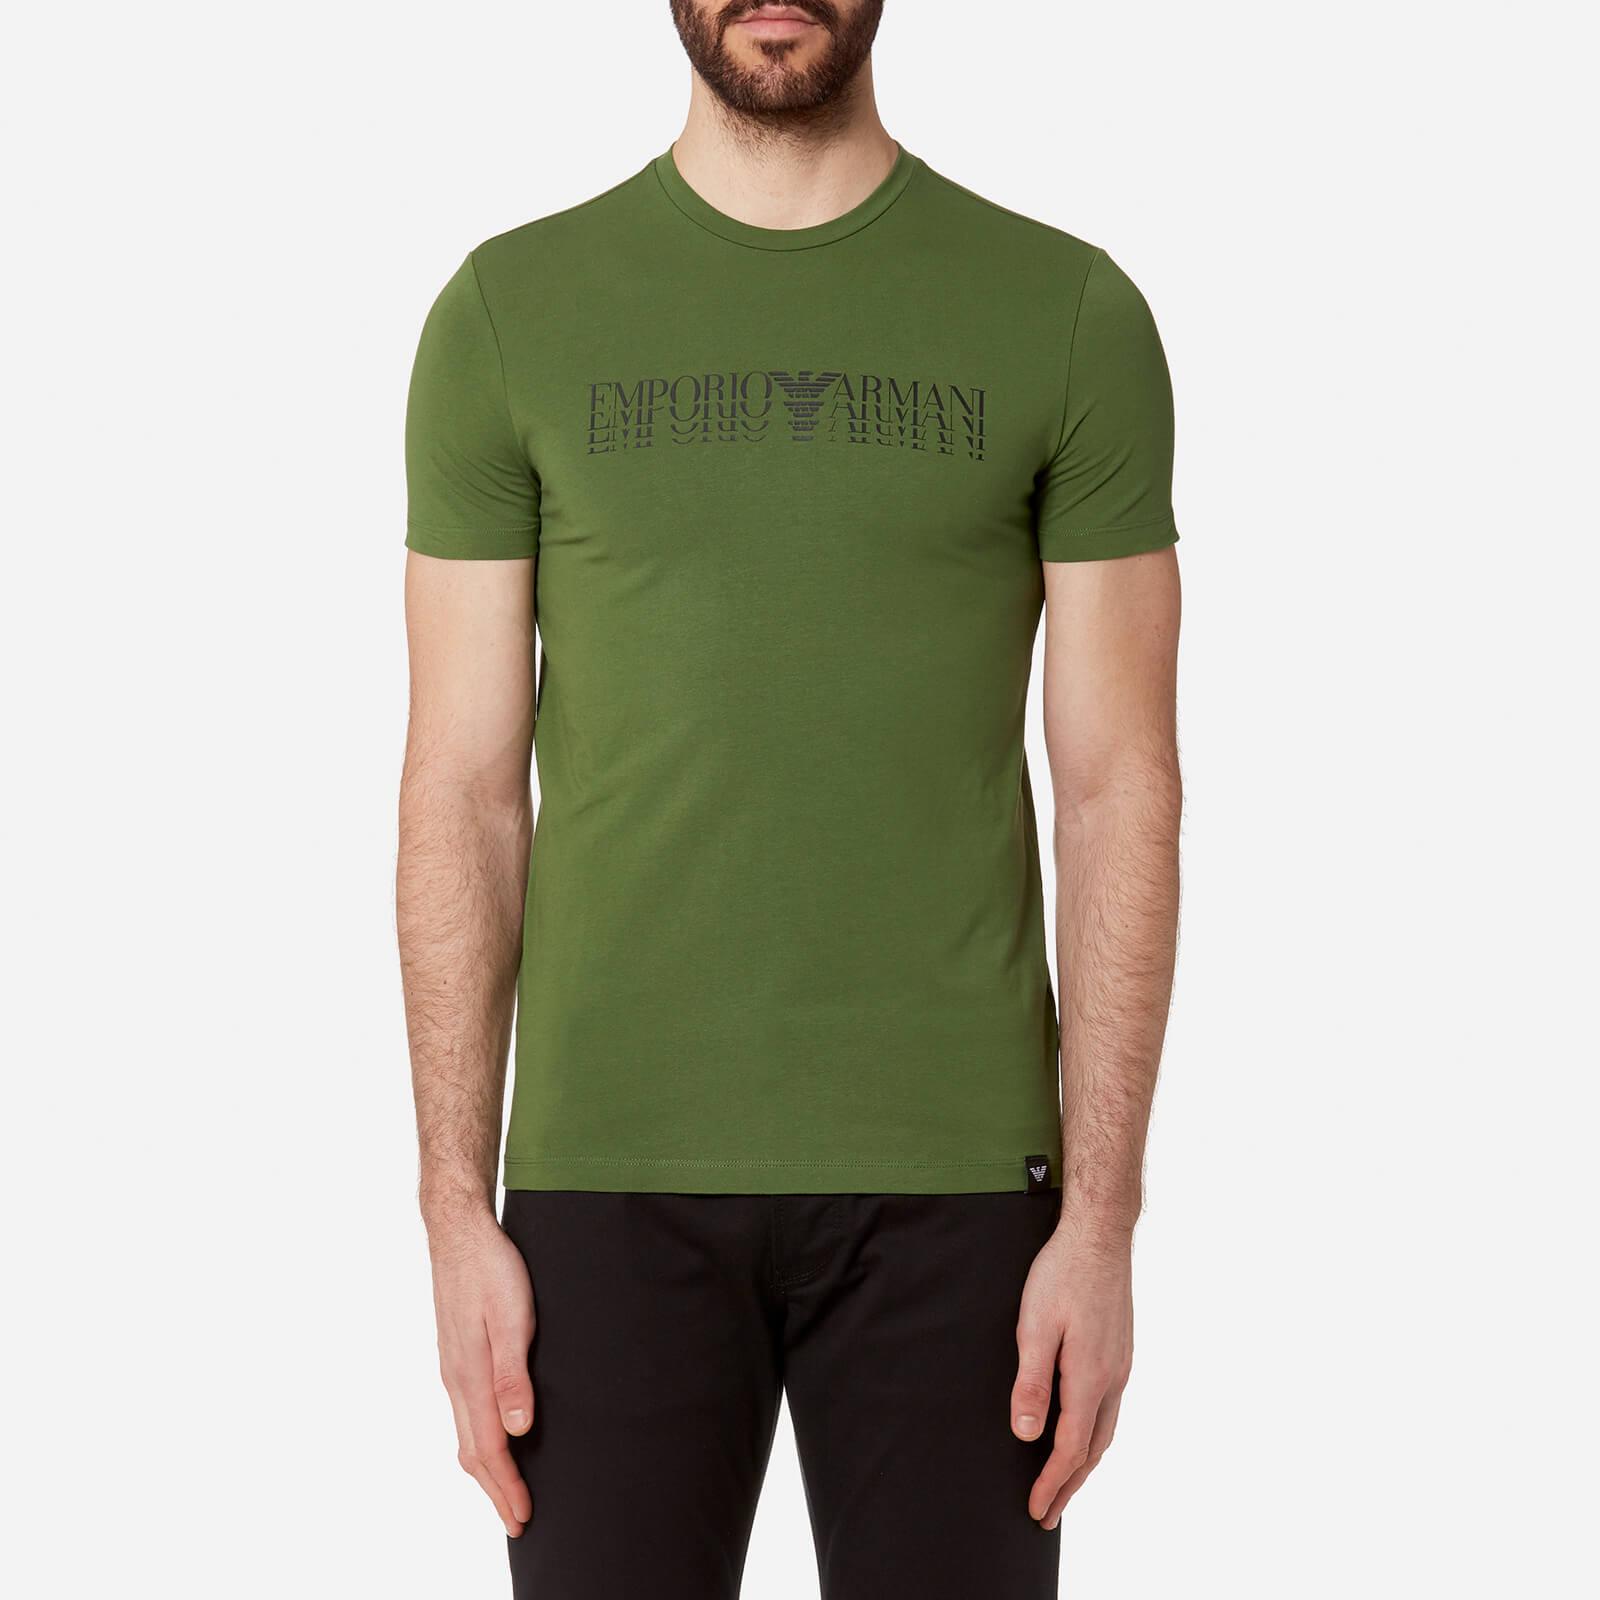 861929cf18 Emporio Armani Men's Shadow Logo T-Shirt - Verde Prato